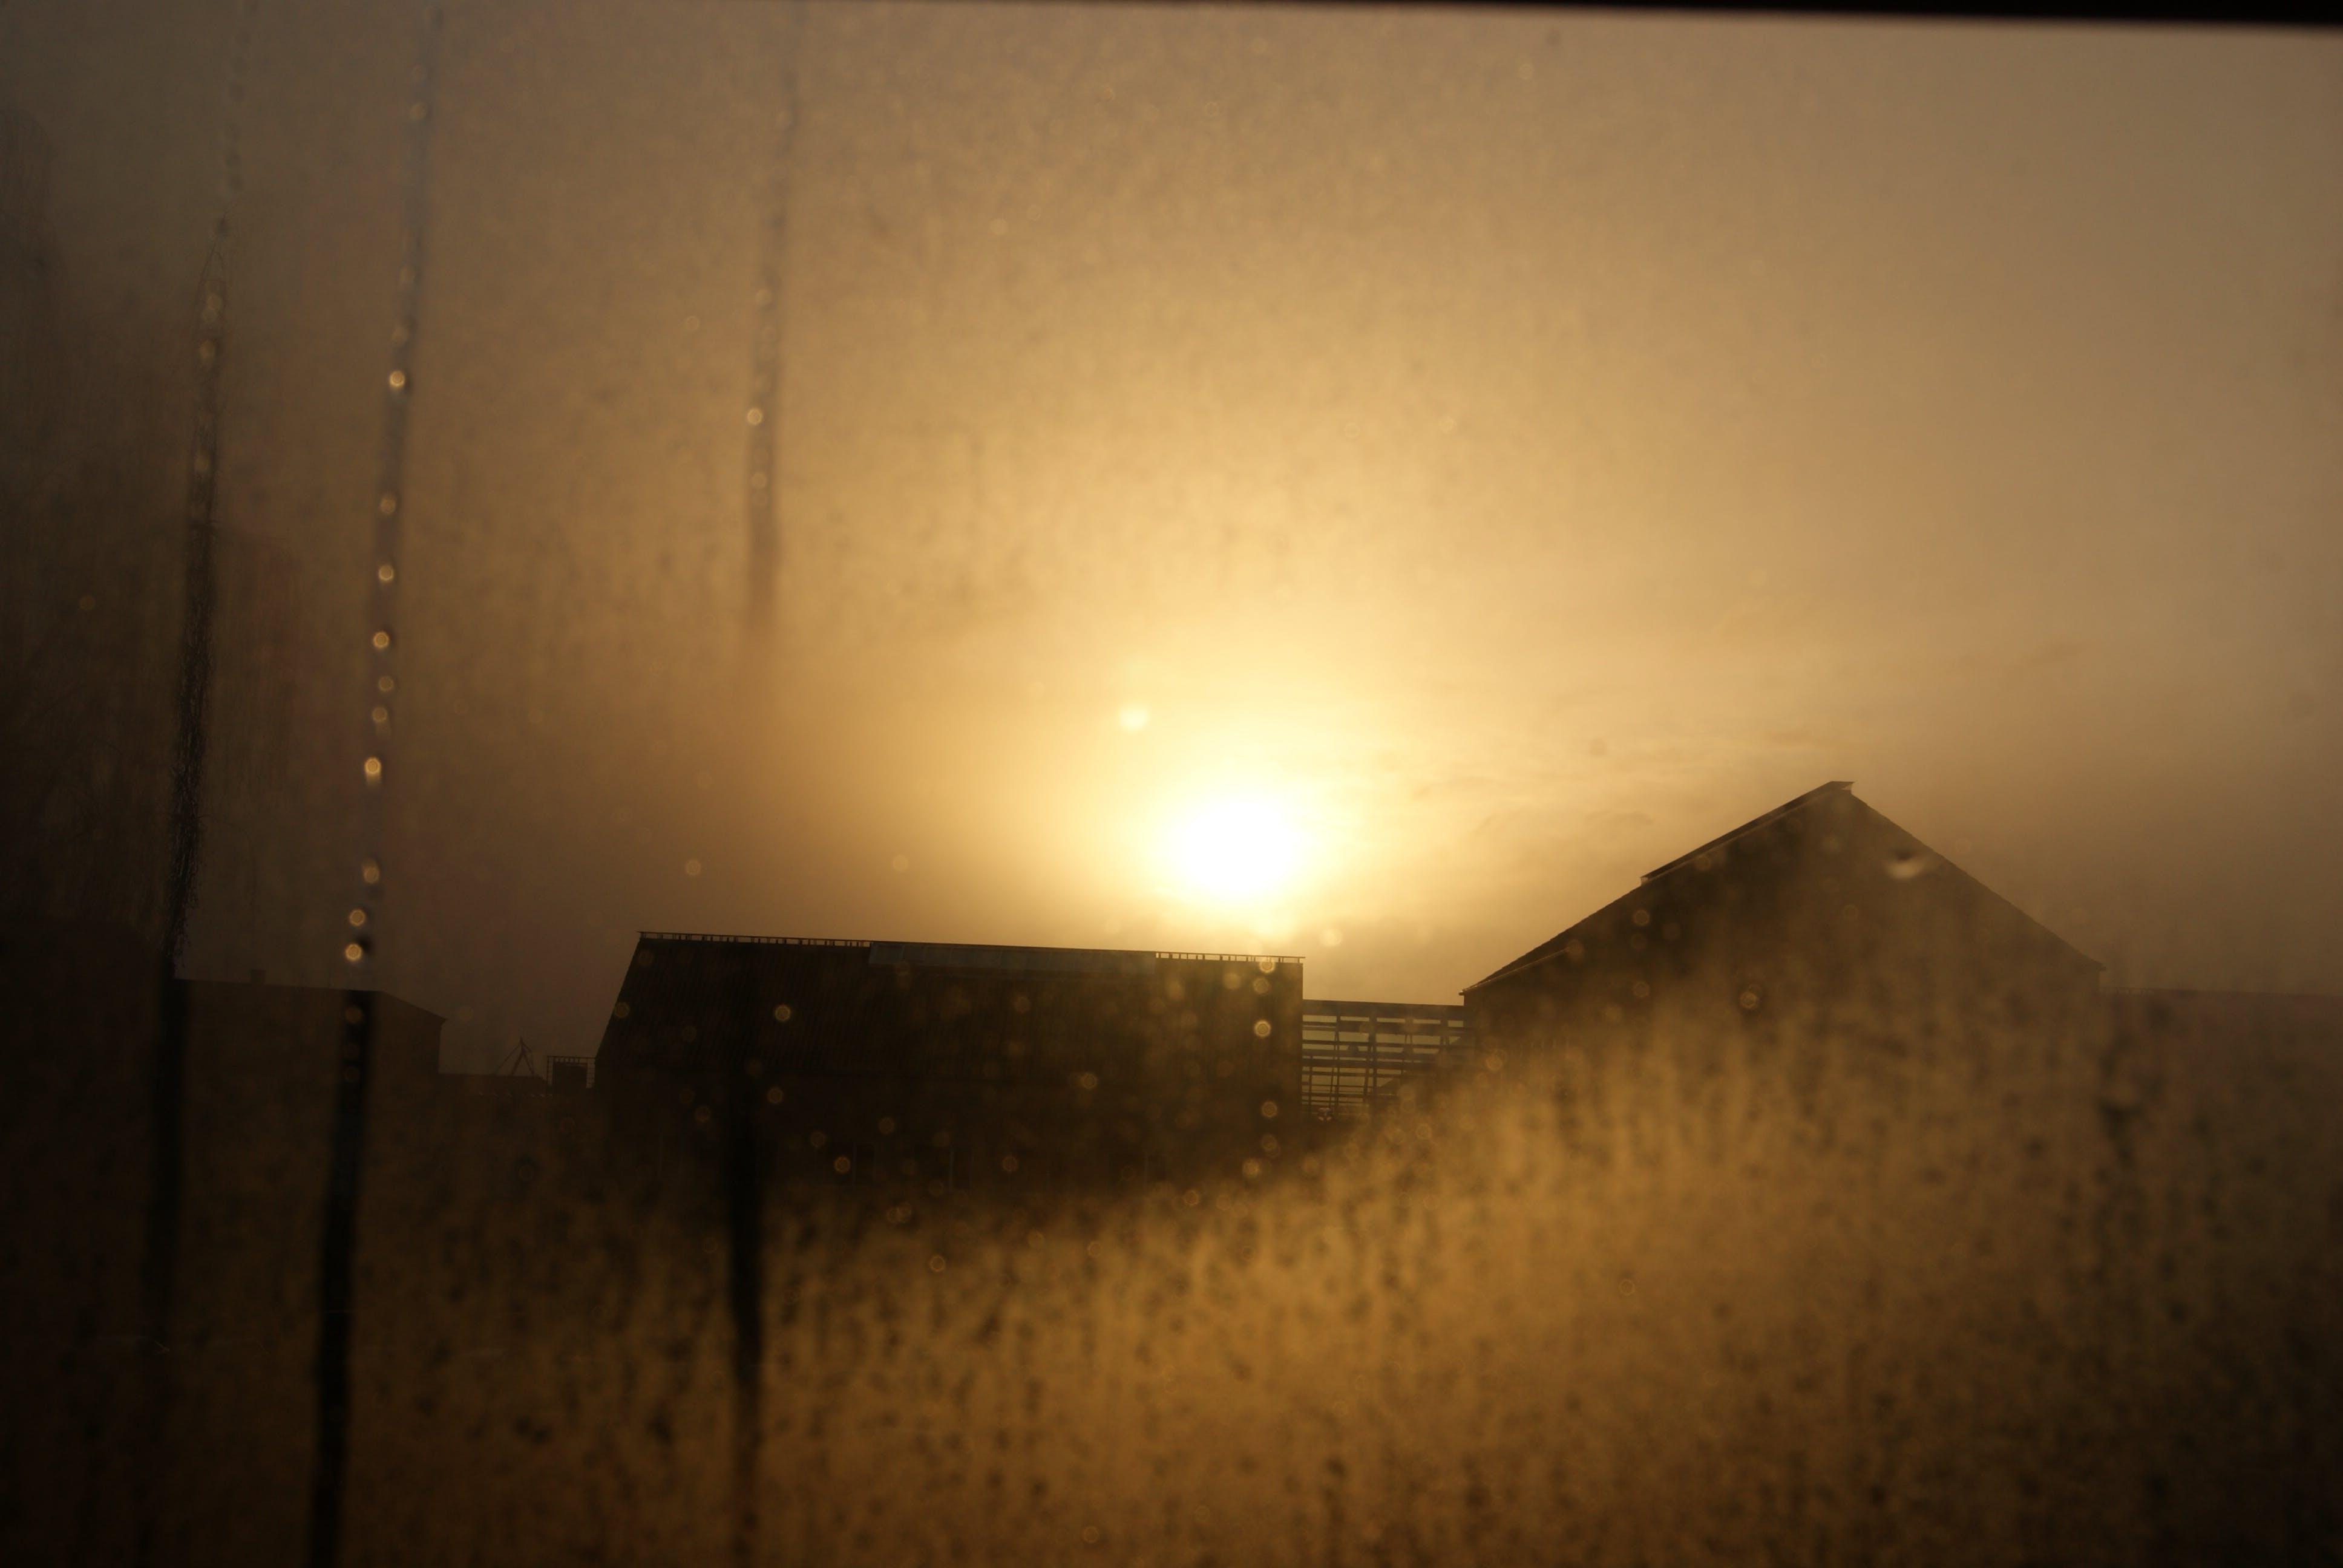 Free stock photo of building, dew, silhouette, sun